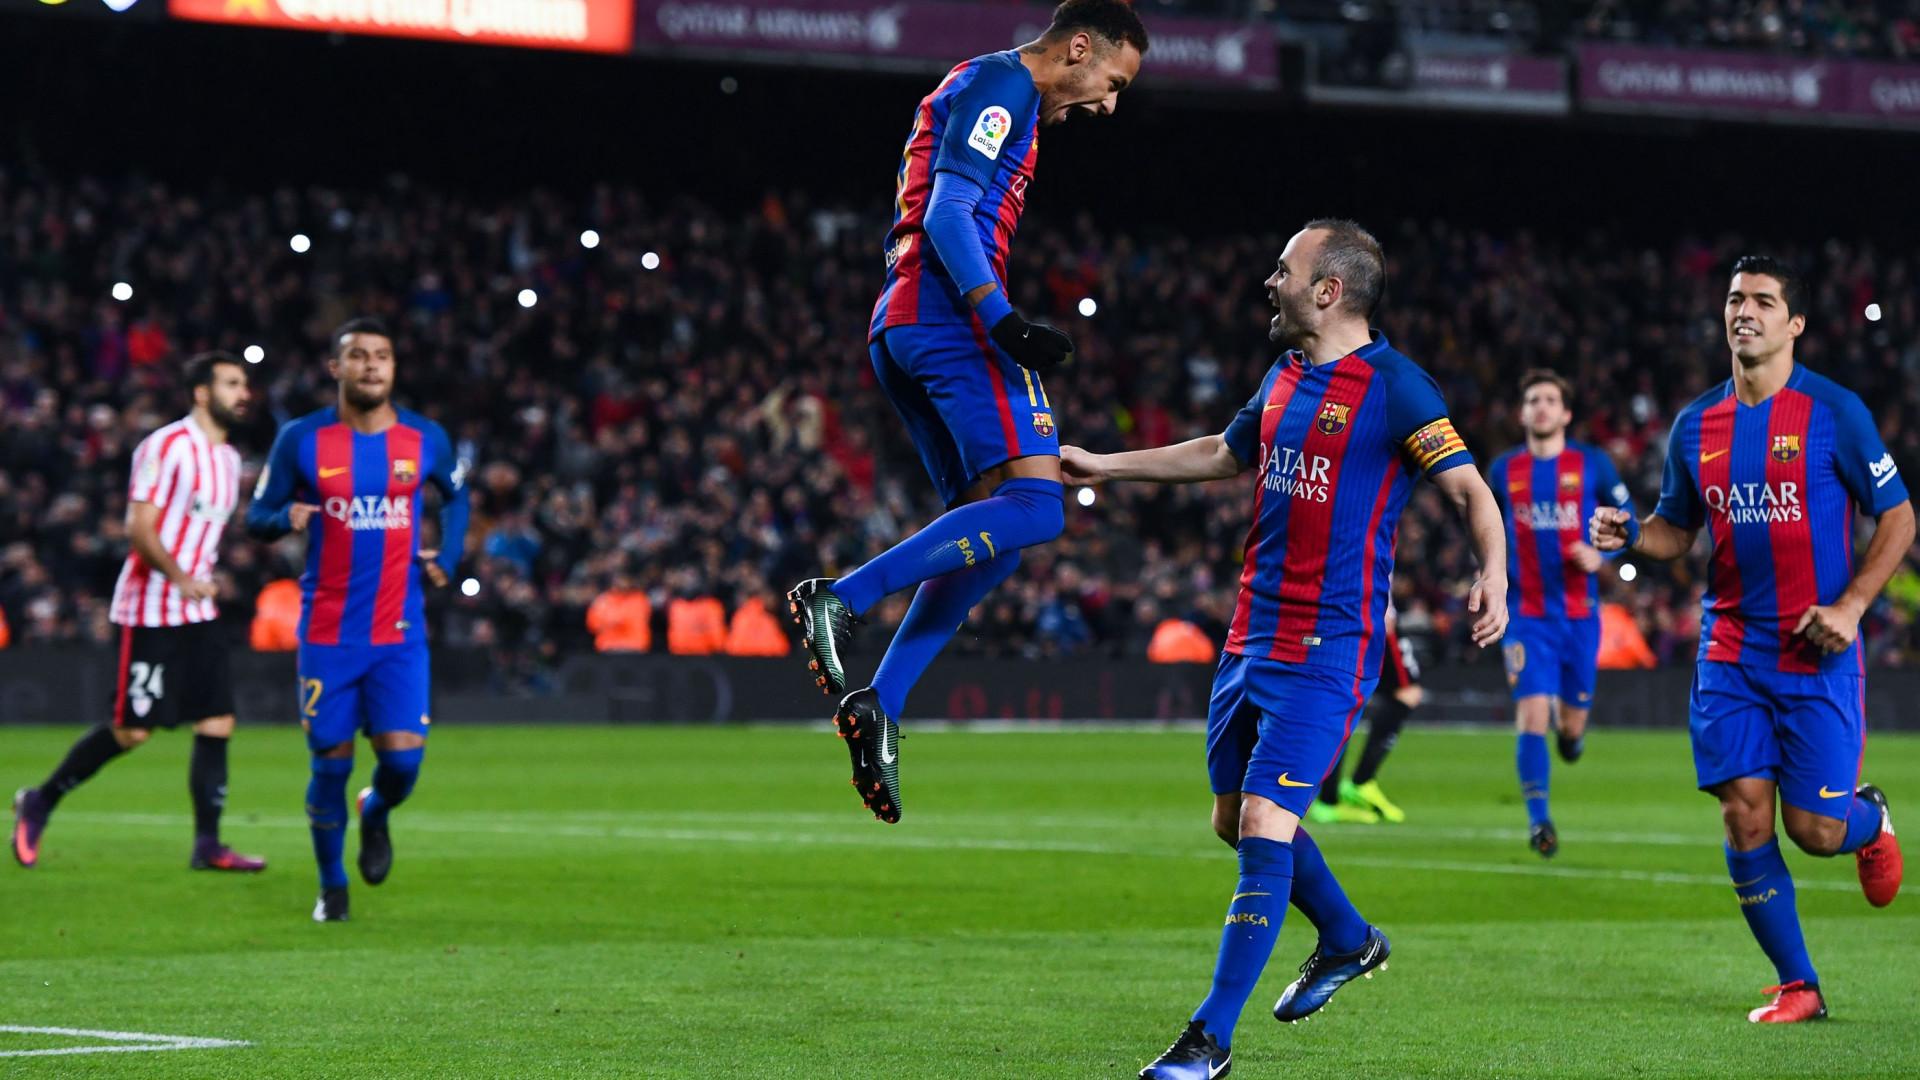 Iniesta 'autoriza' Neymar a vestir a camisola do... Real Madrid